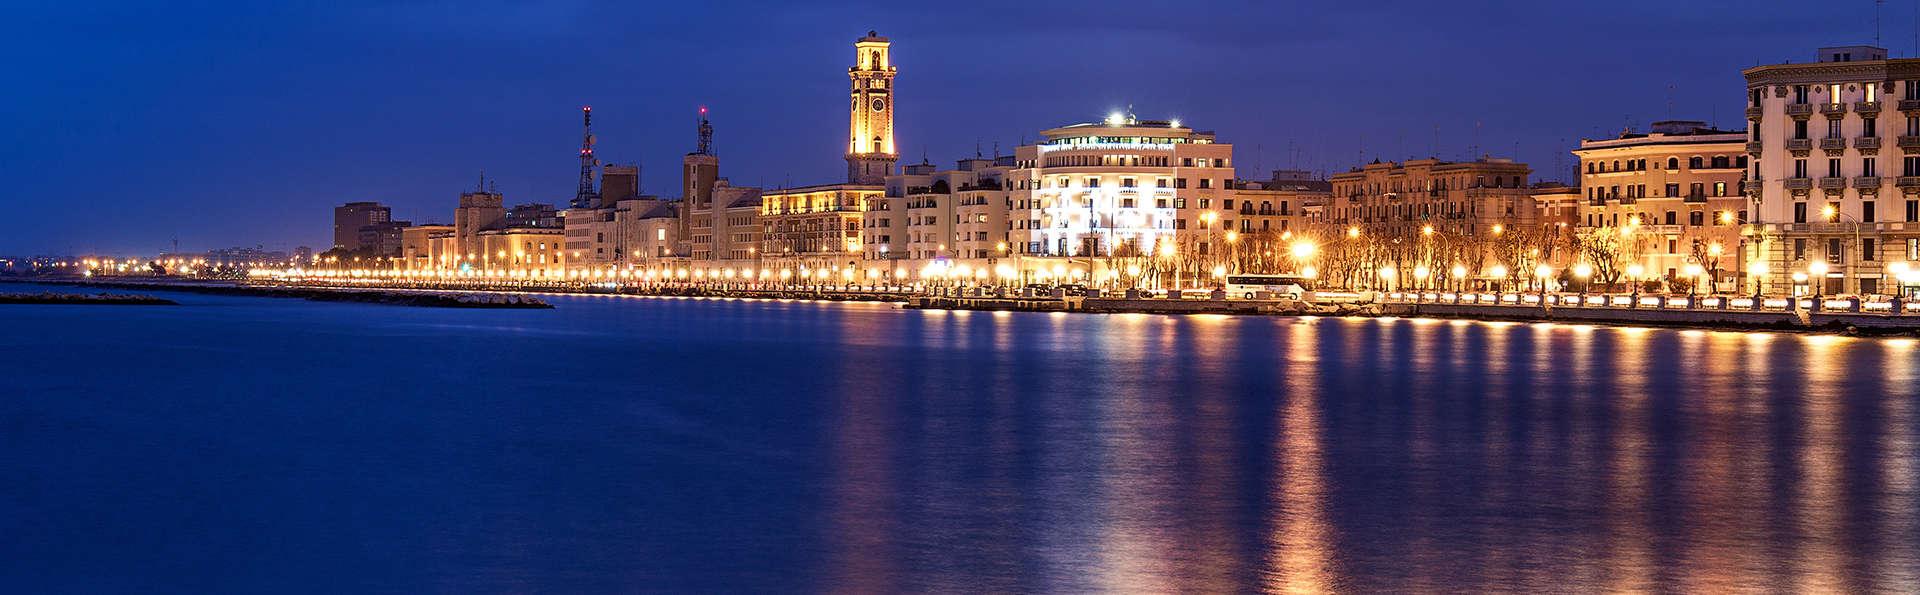 Hotel Murgia - EDIT_destination1.jpg